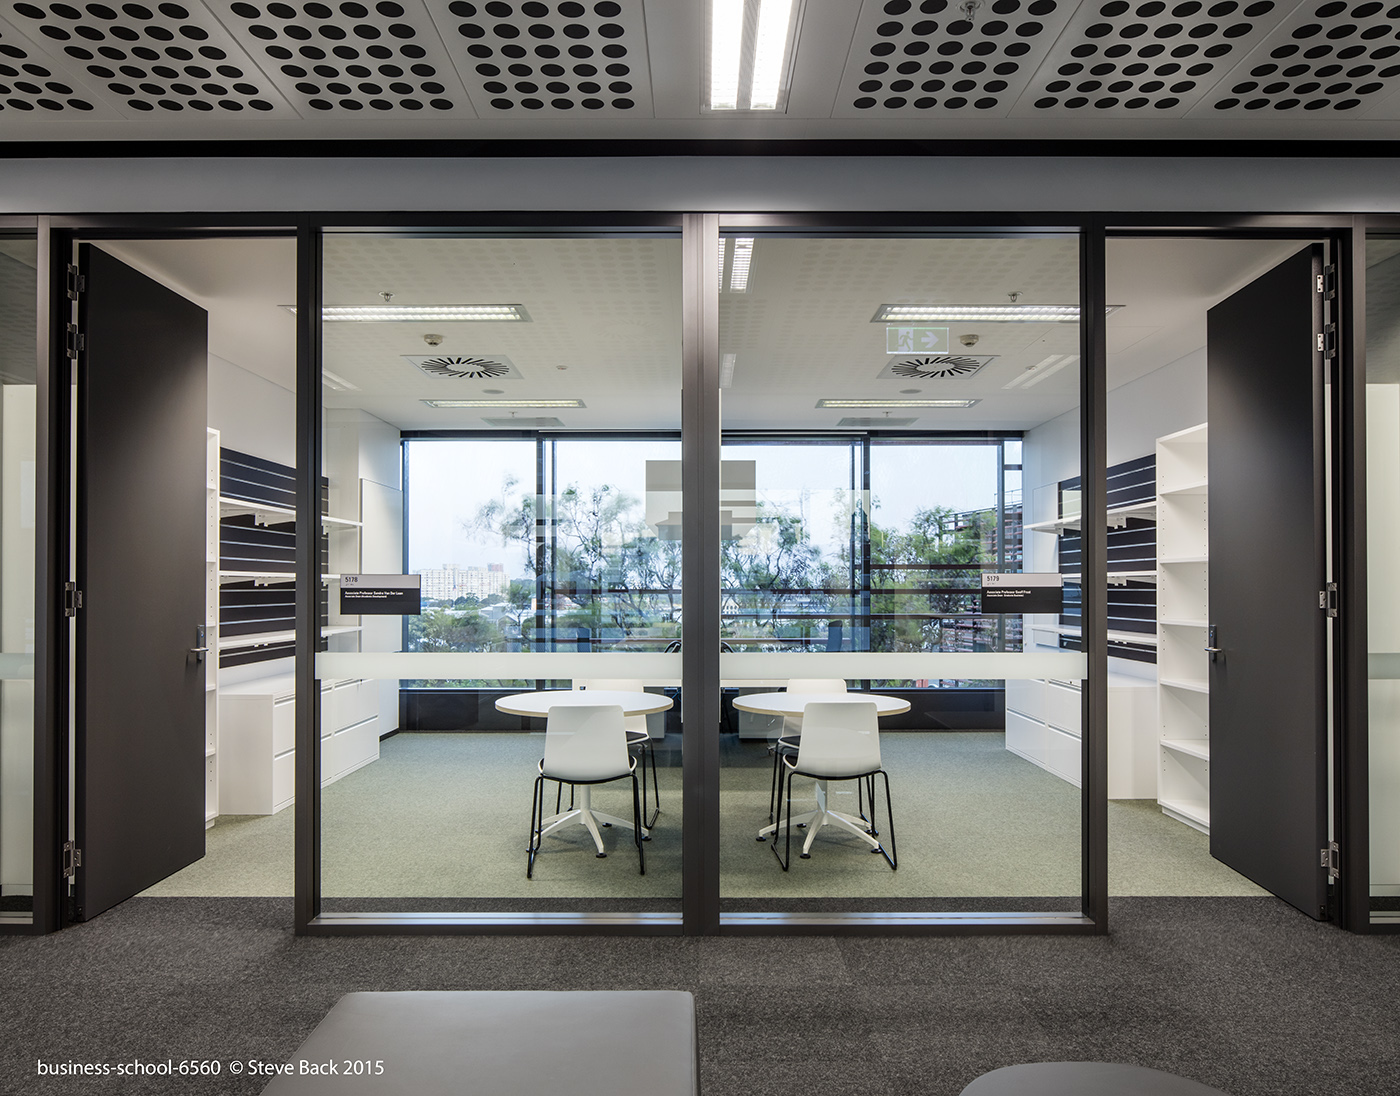 business-school-6560.jpg